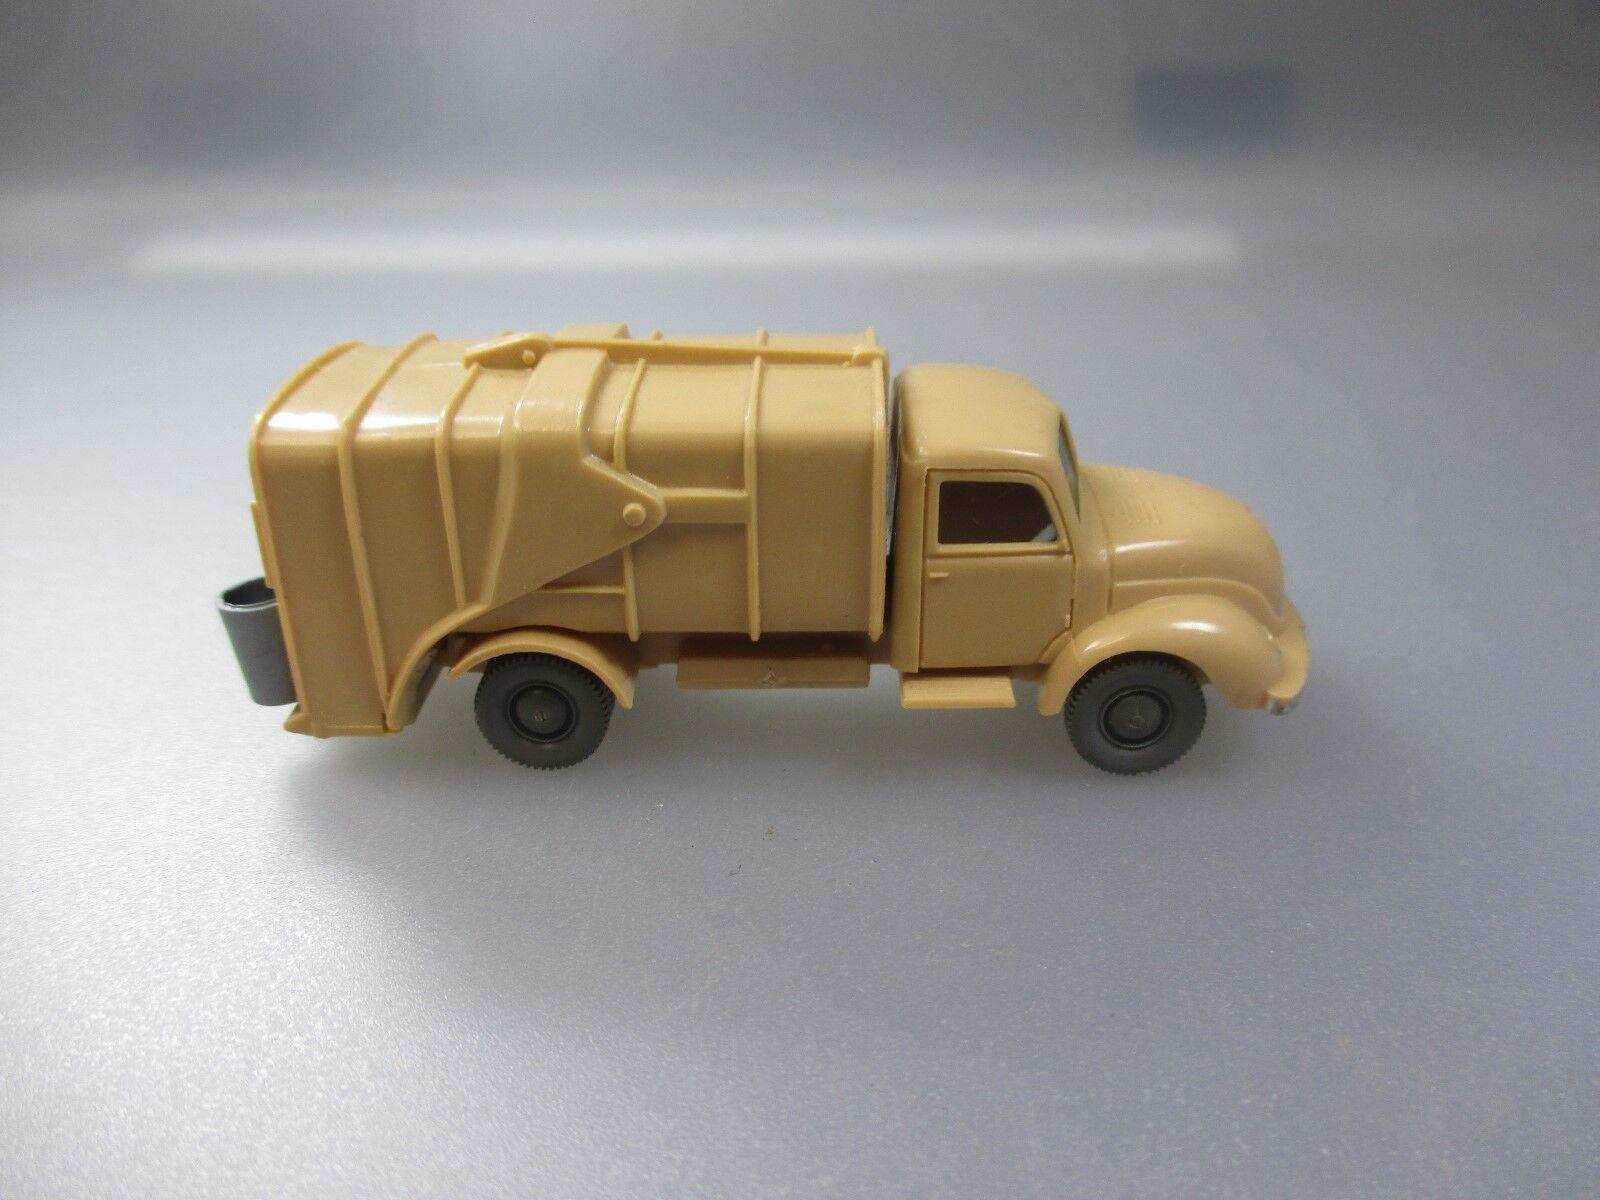 Wiking Wiking Wiking Magirus Müllwagen mit losen Tonnen  (SSK68) b941df